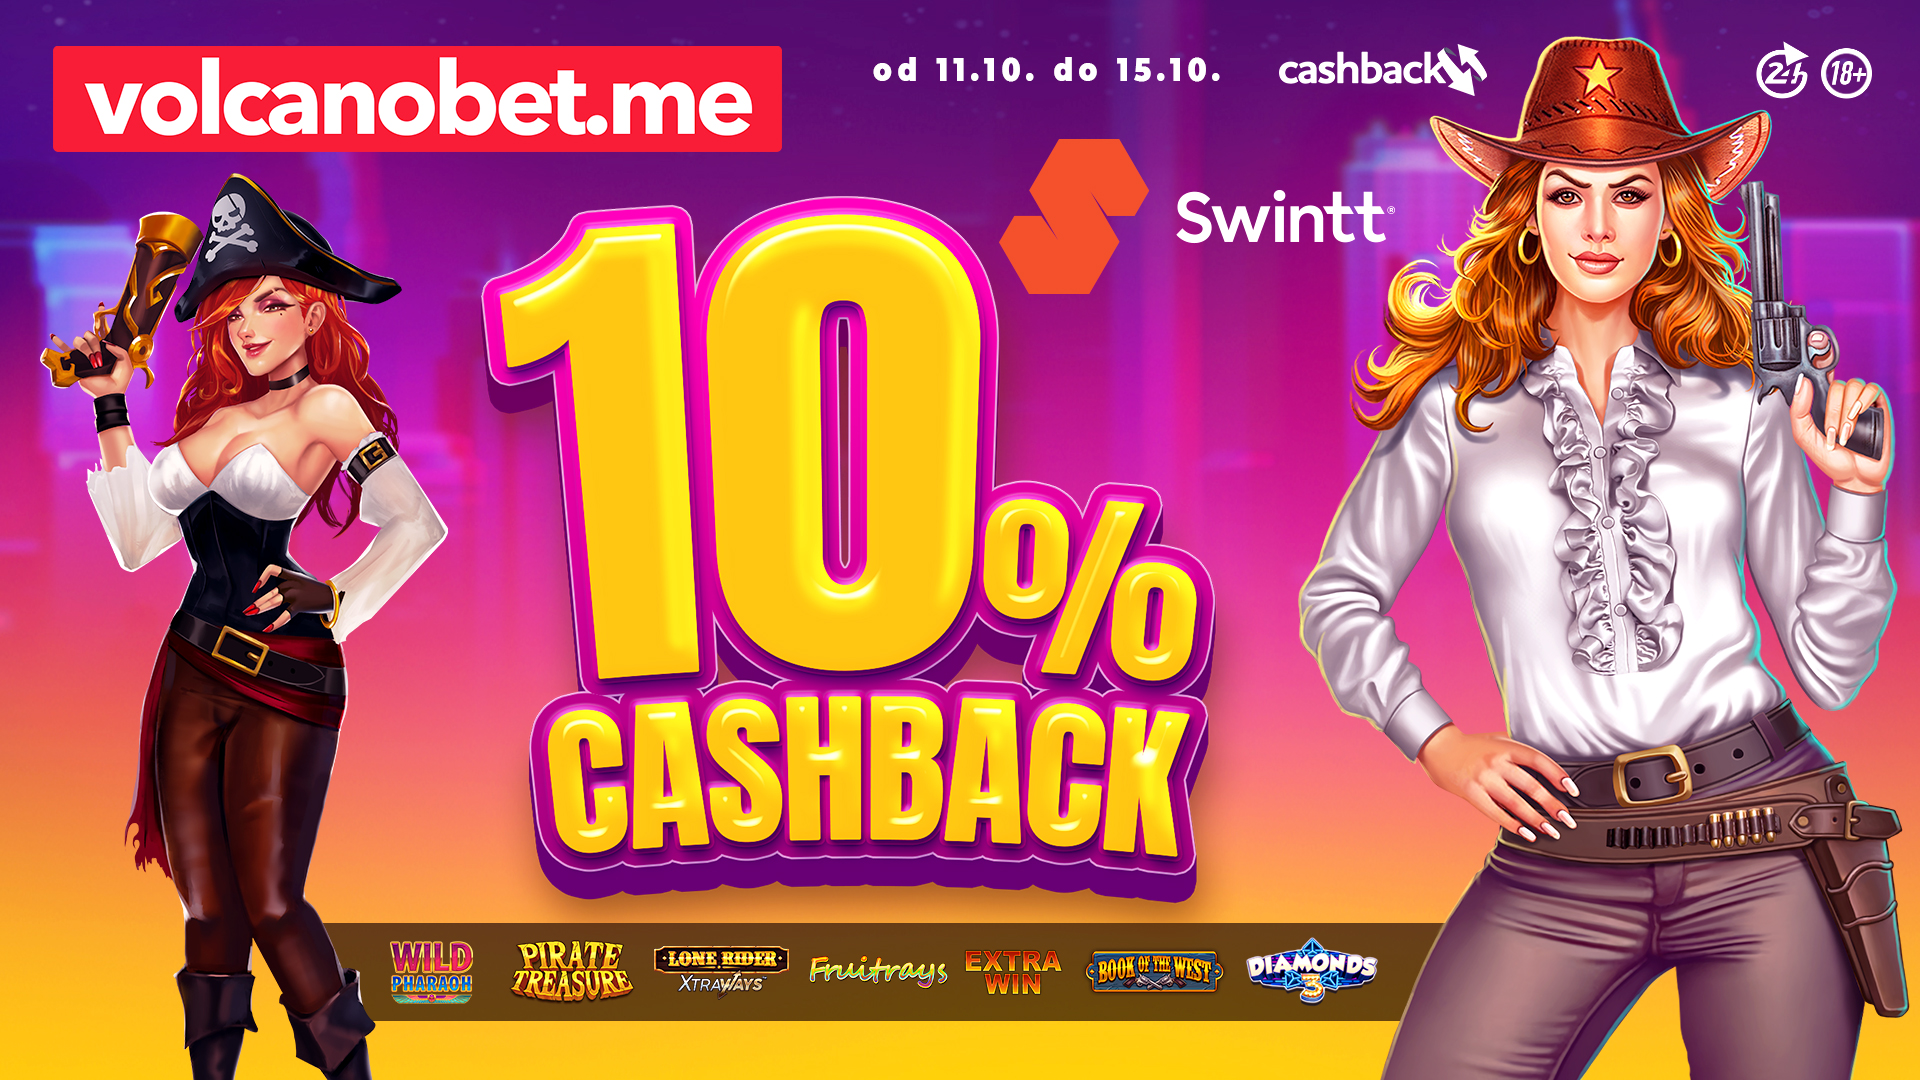 Swintt CashBack Oktobar